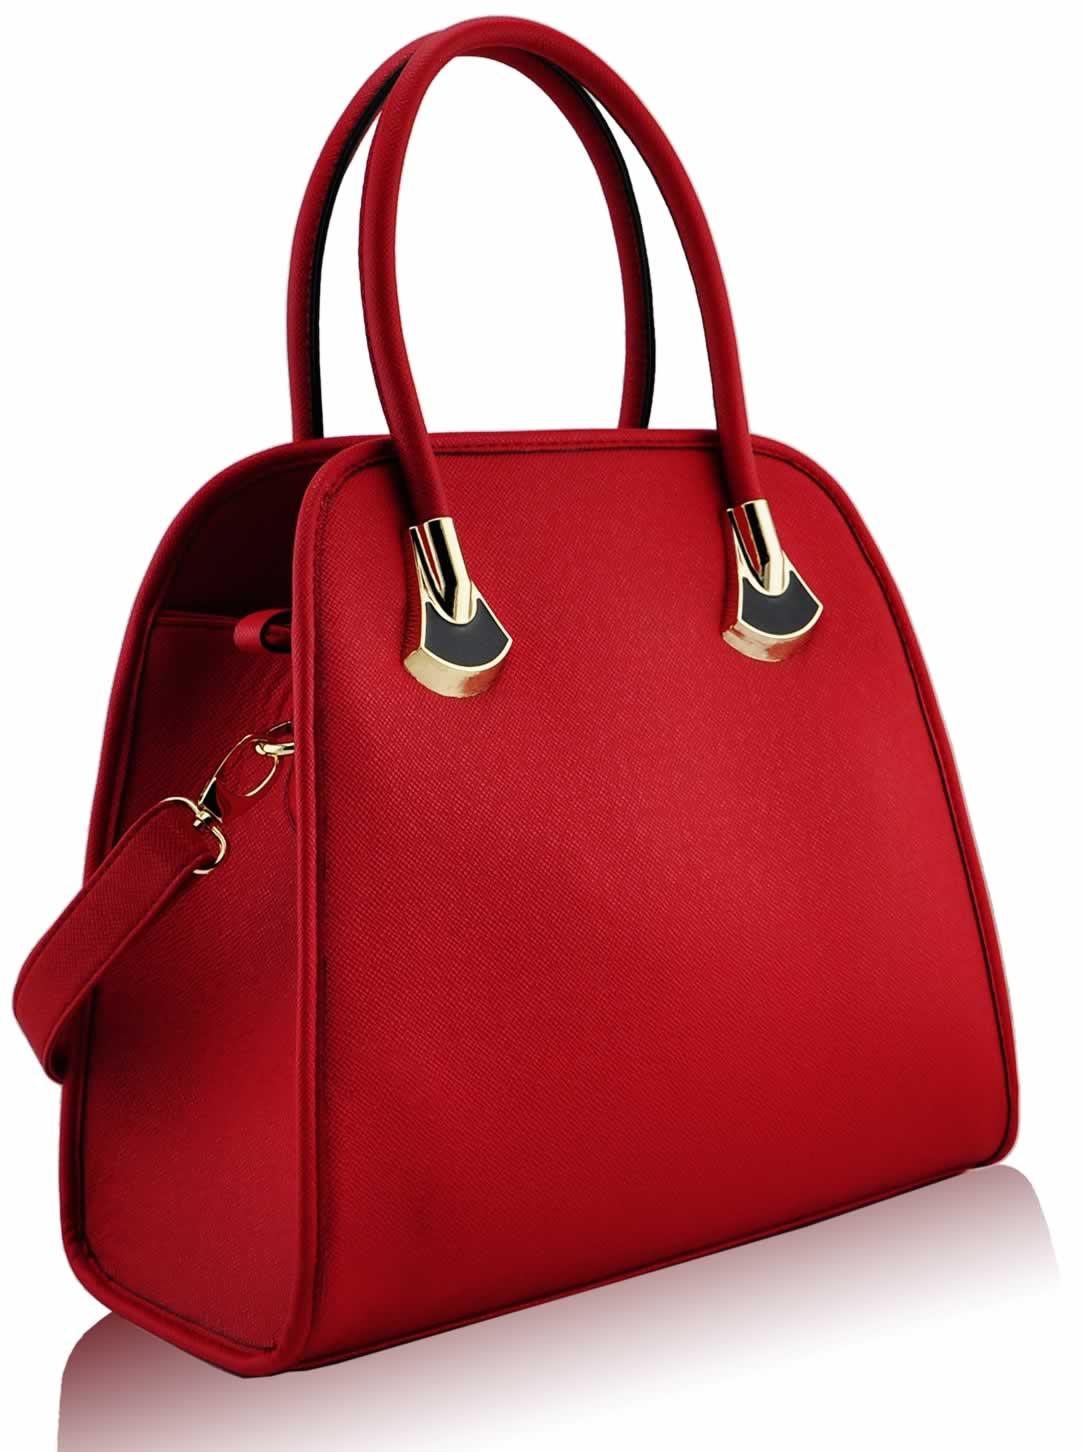 Wholesale bag - Nude Fashion Grab Tote bag